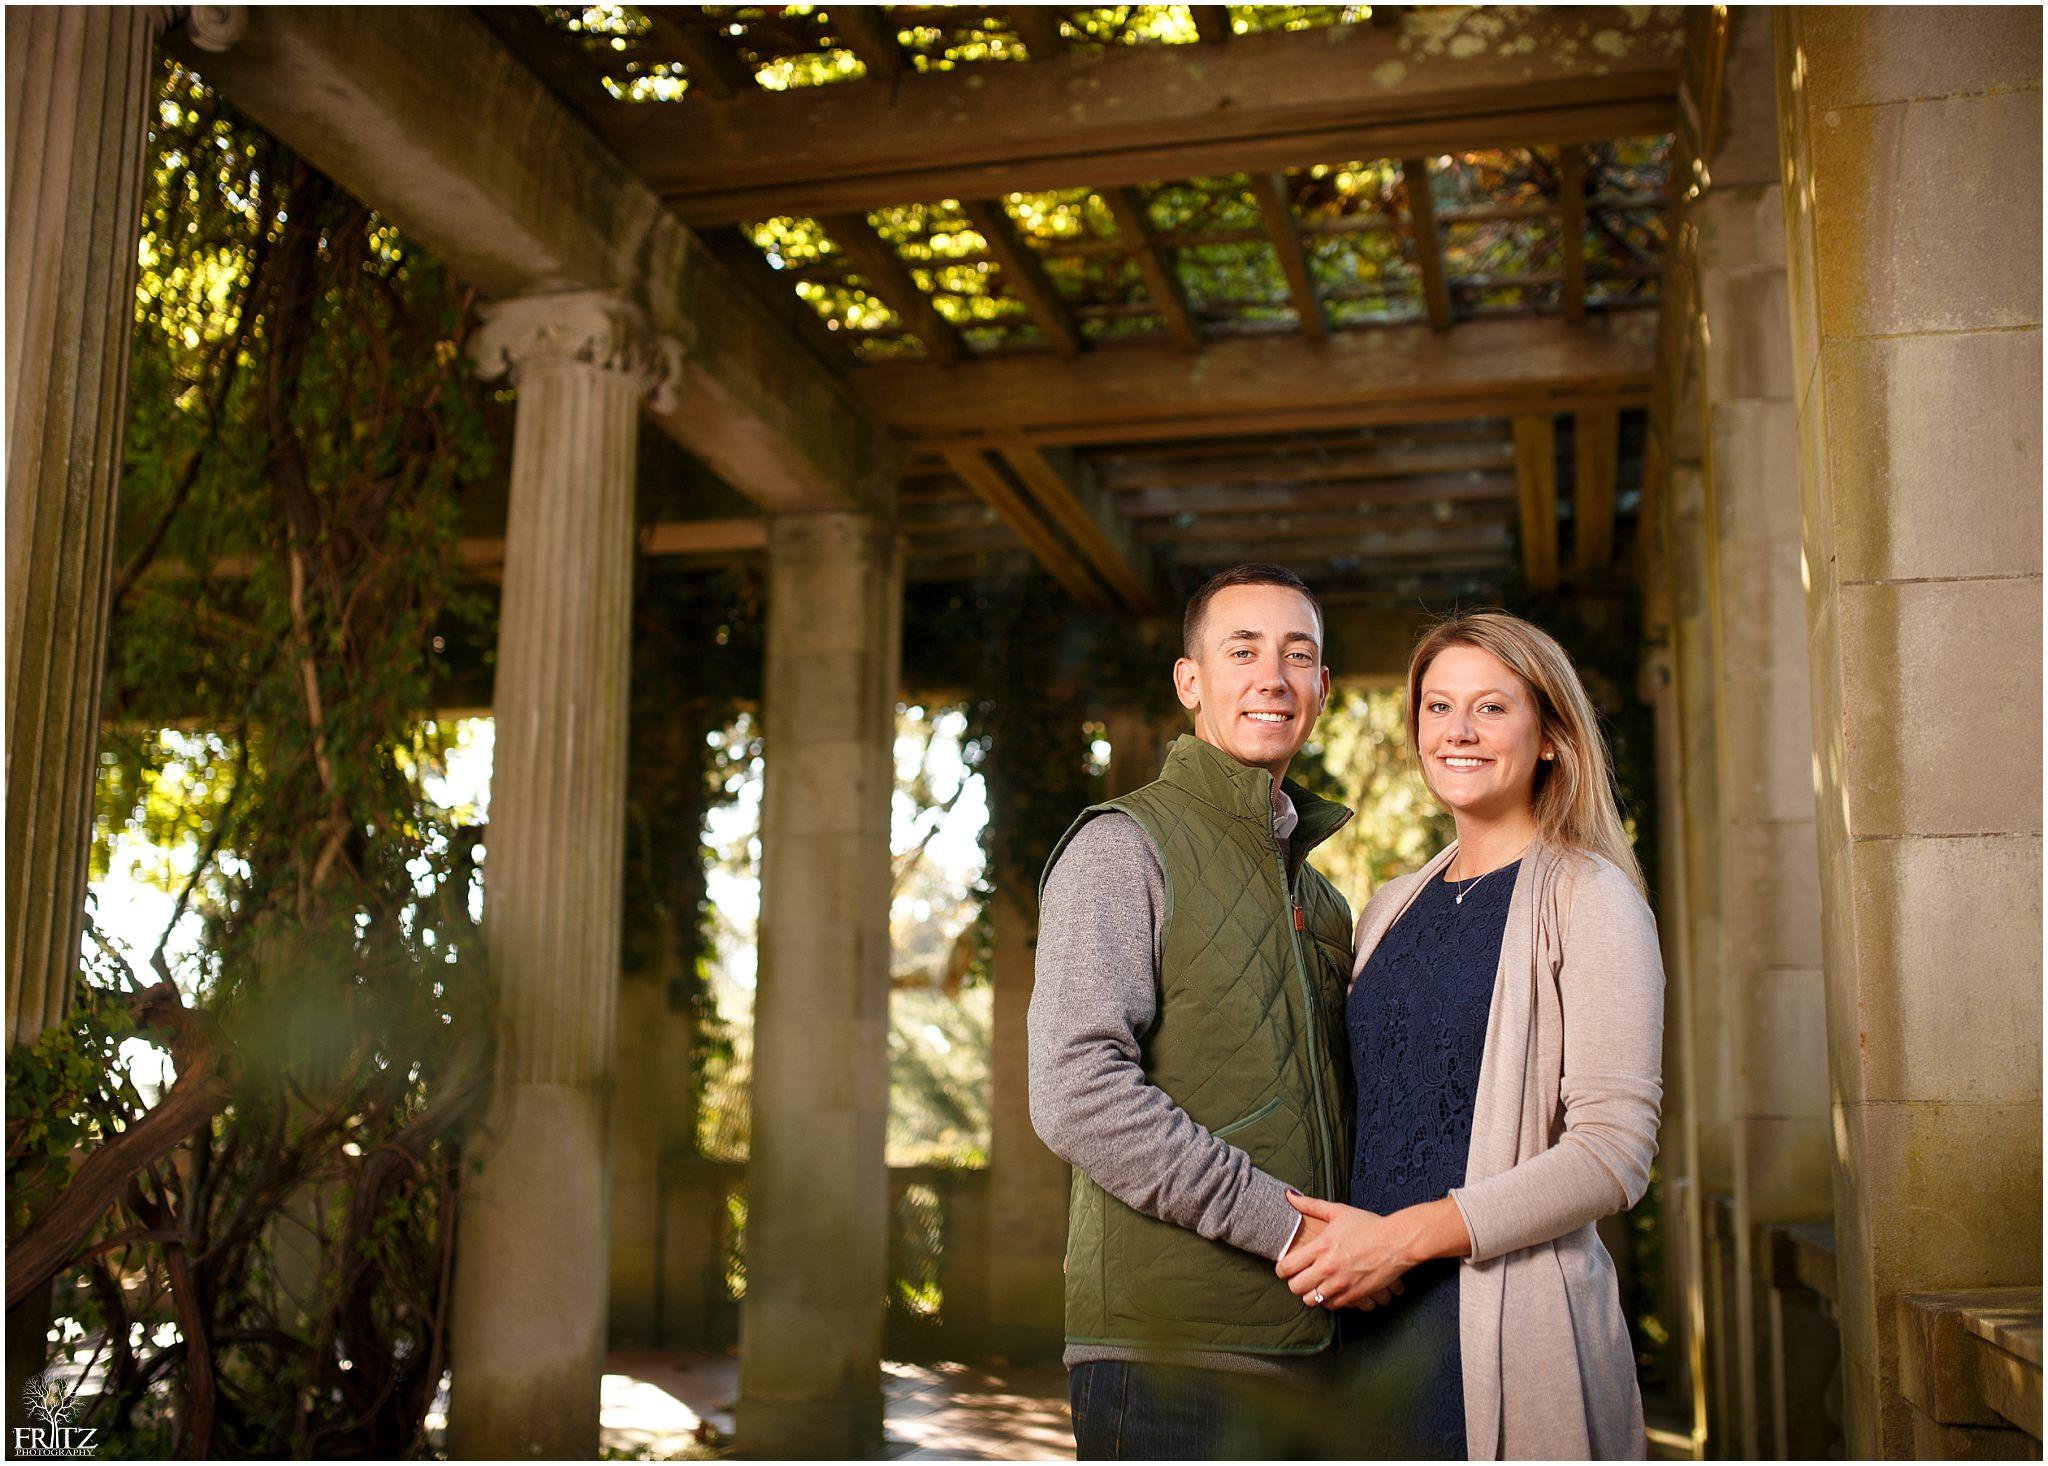 Harkness Park Engagement